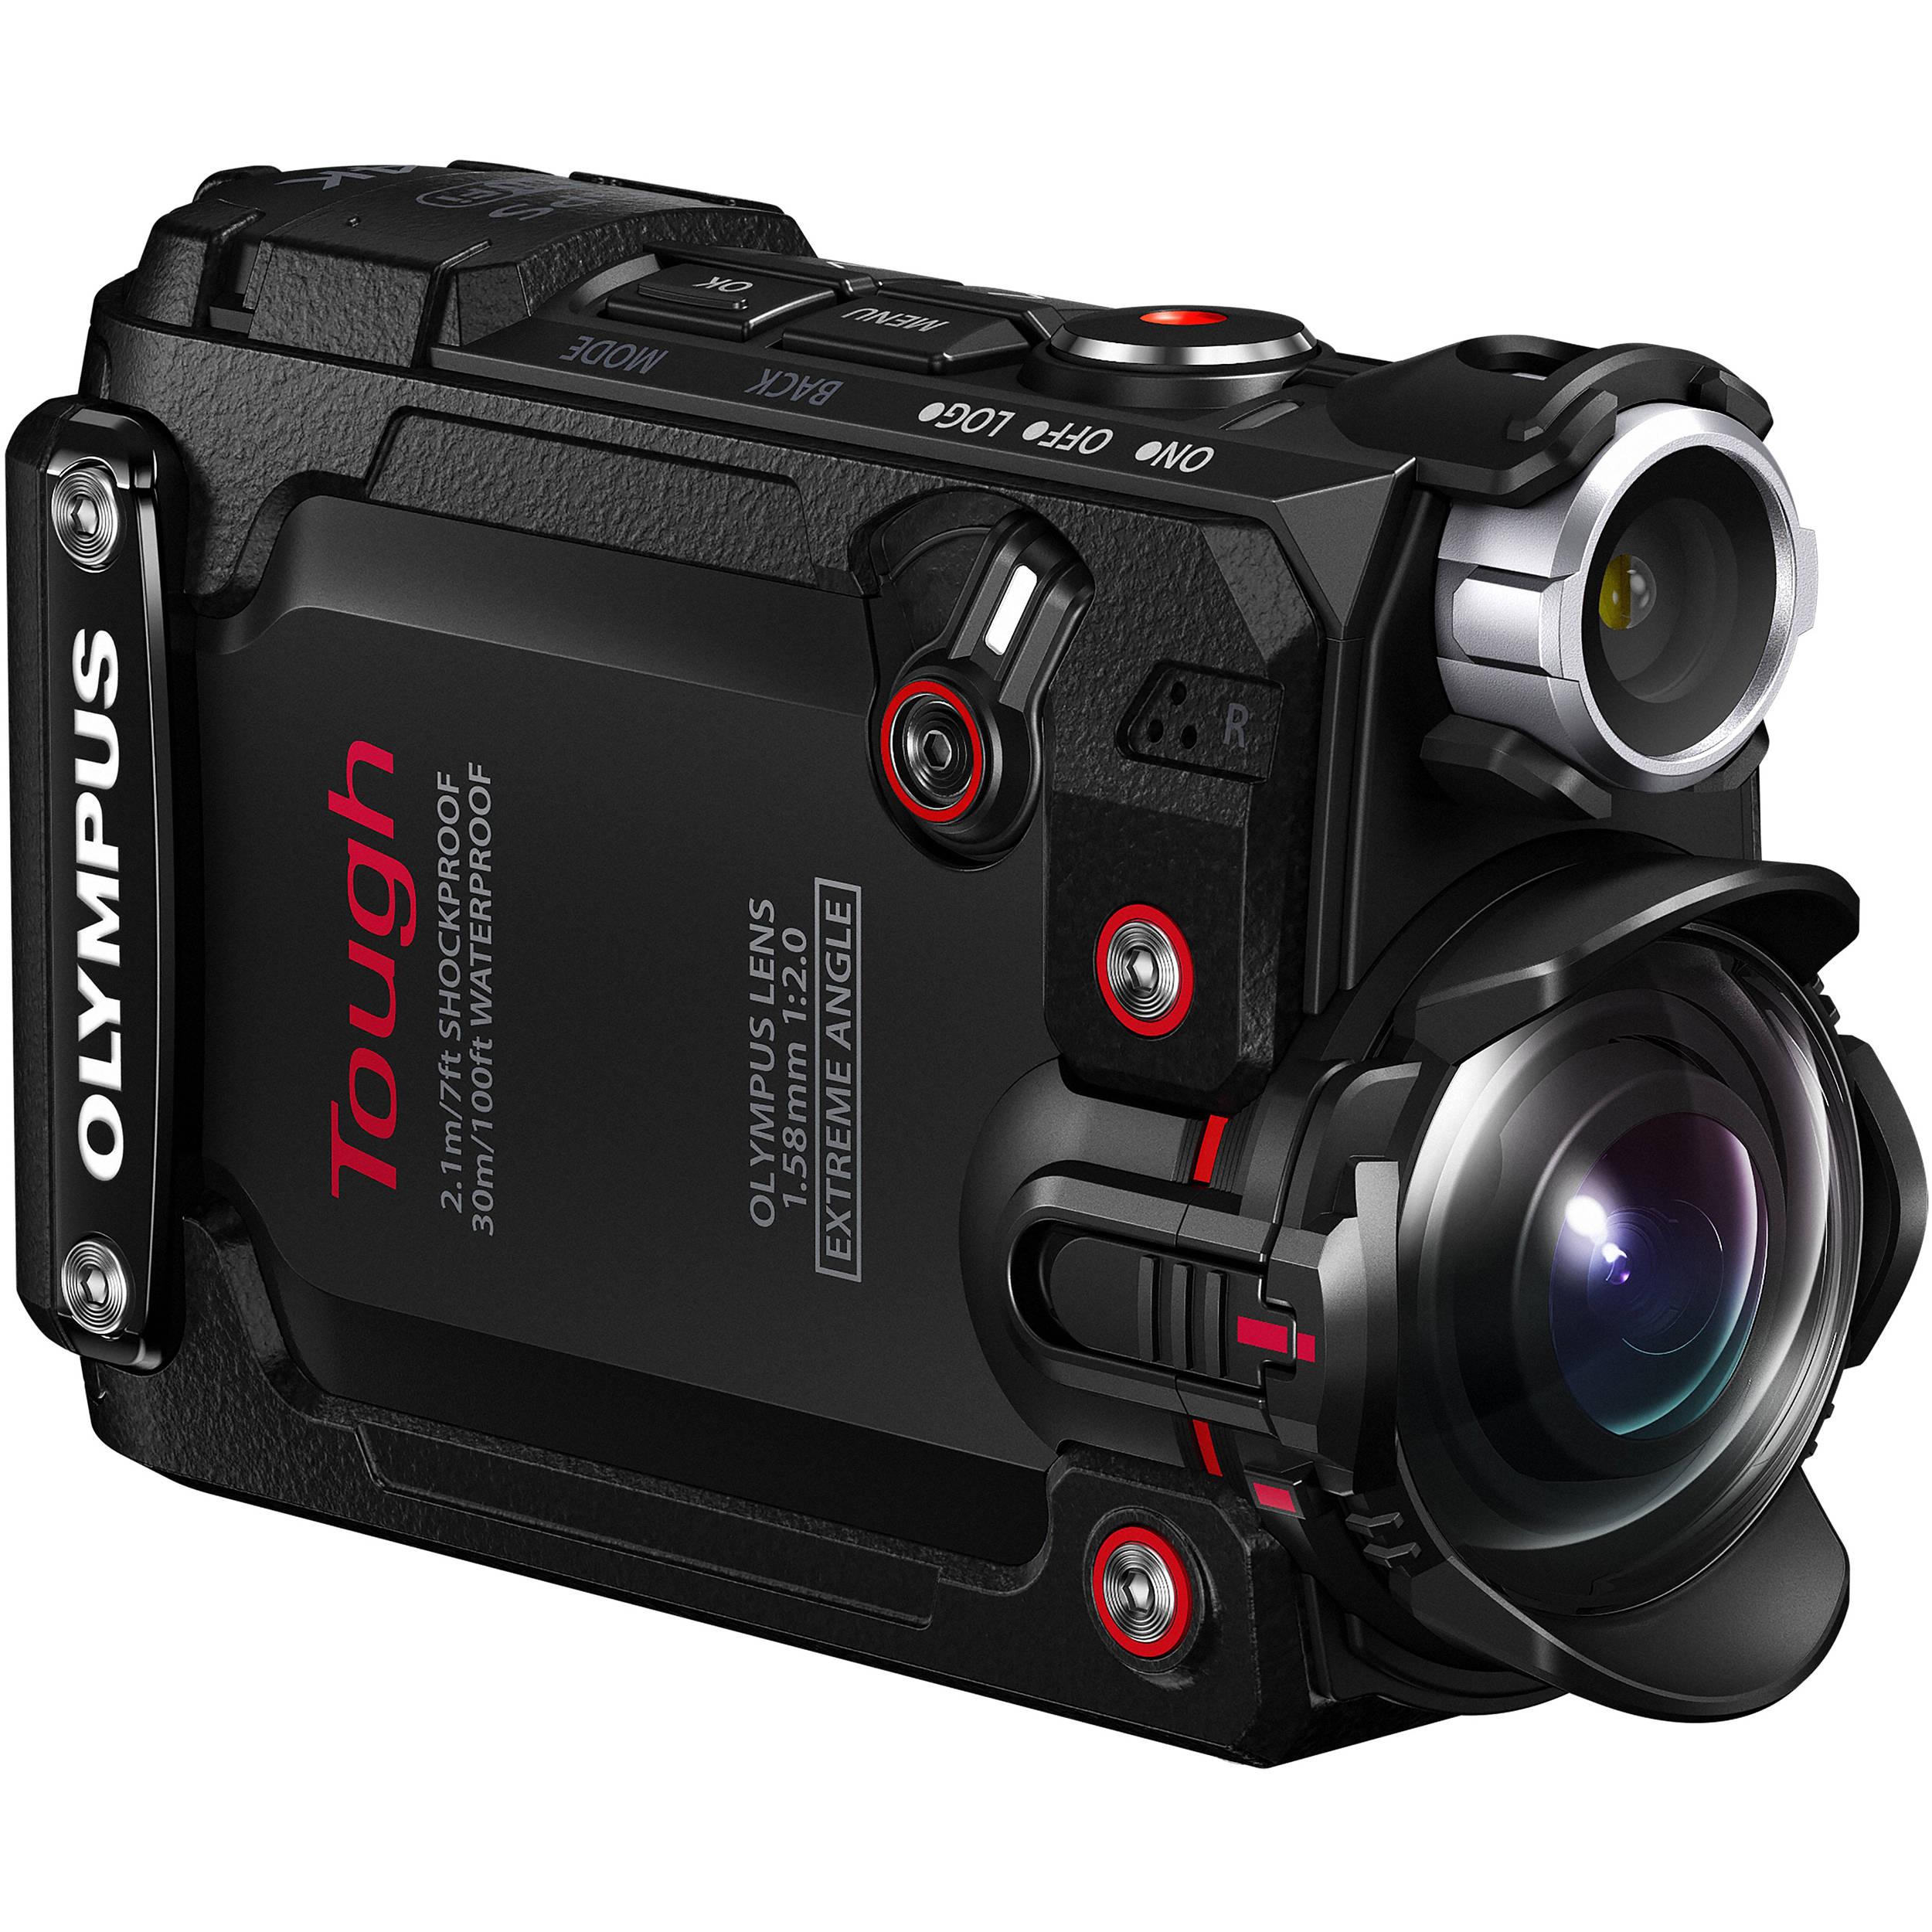 Olympus Stylus Tough Tg Tracker Action Camera Black